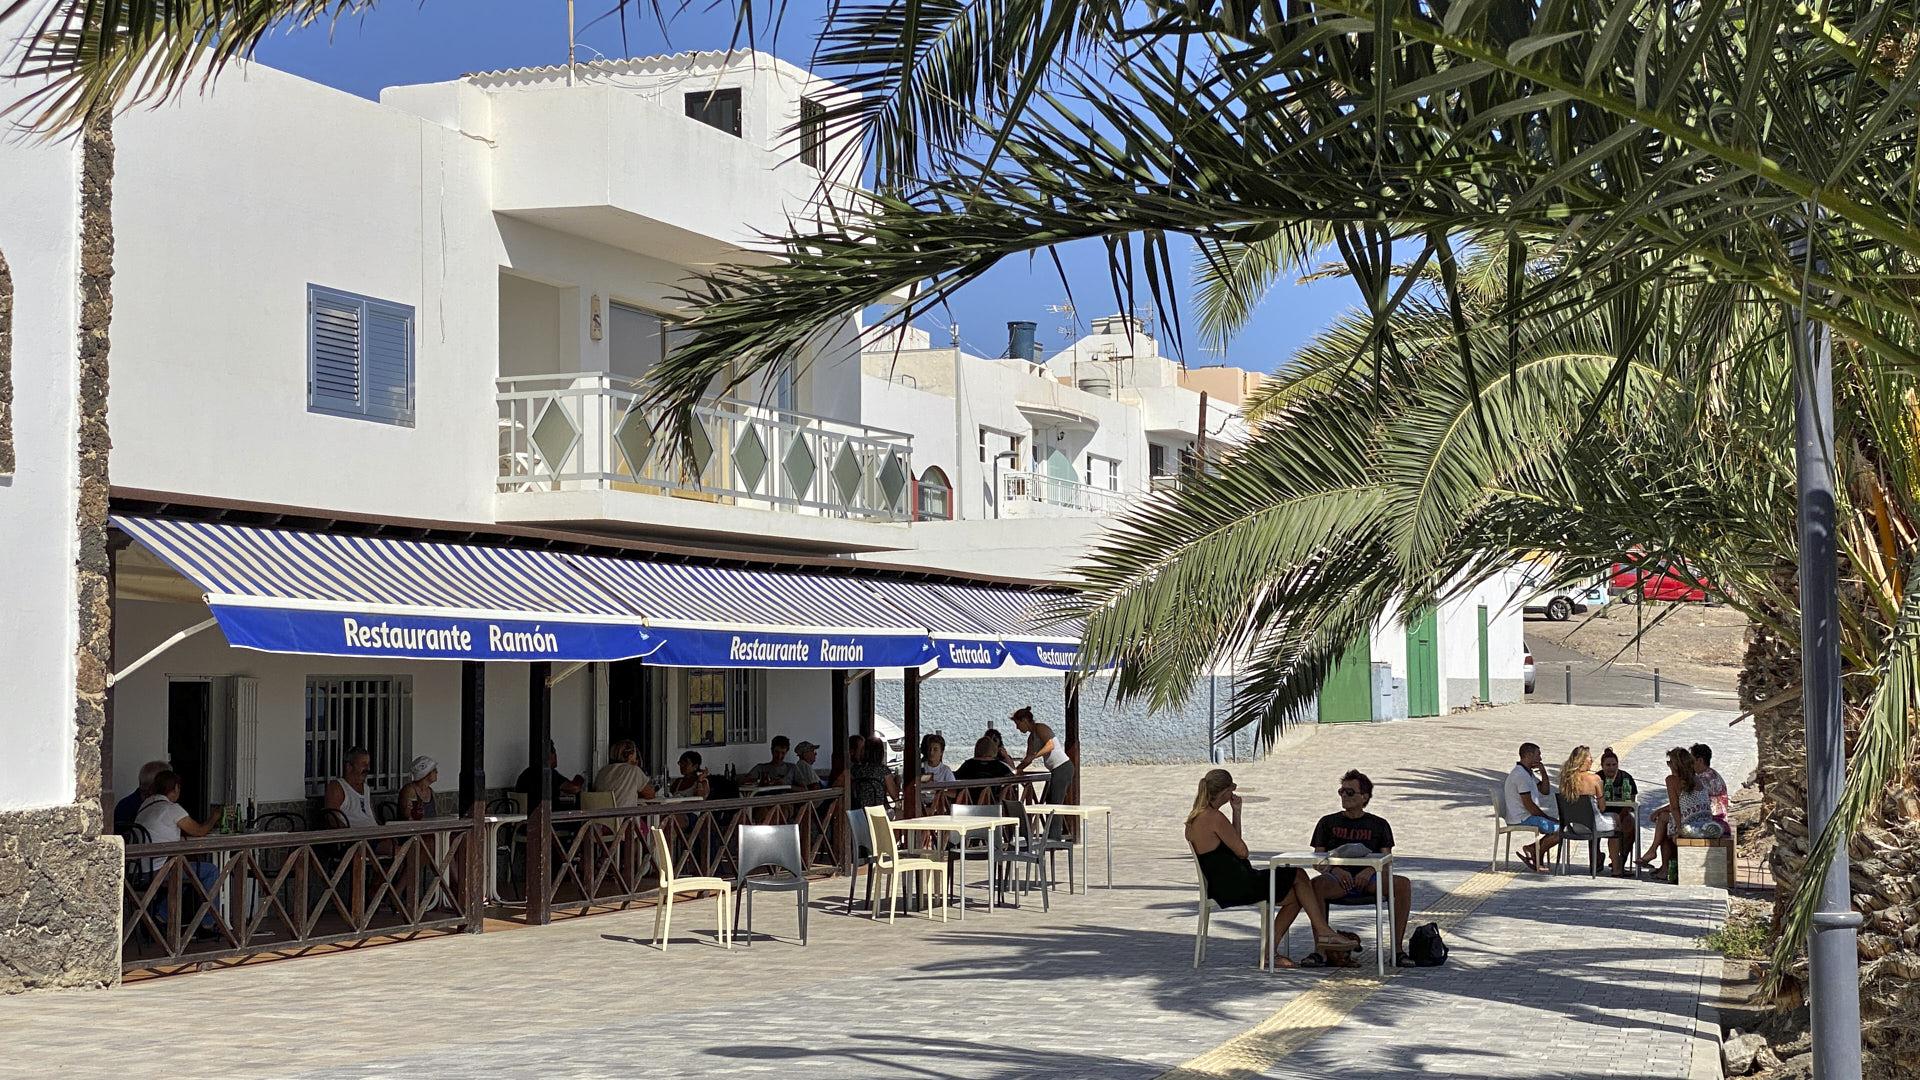 Der Ort La Lajita Fuerteventura.